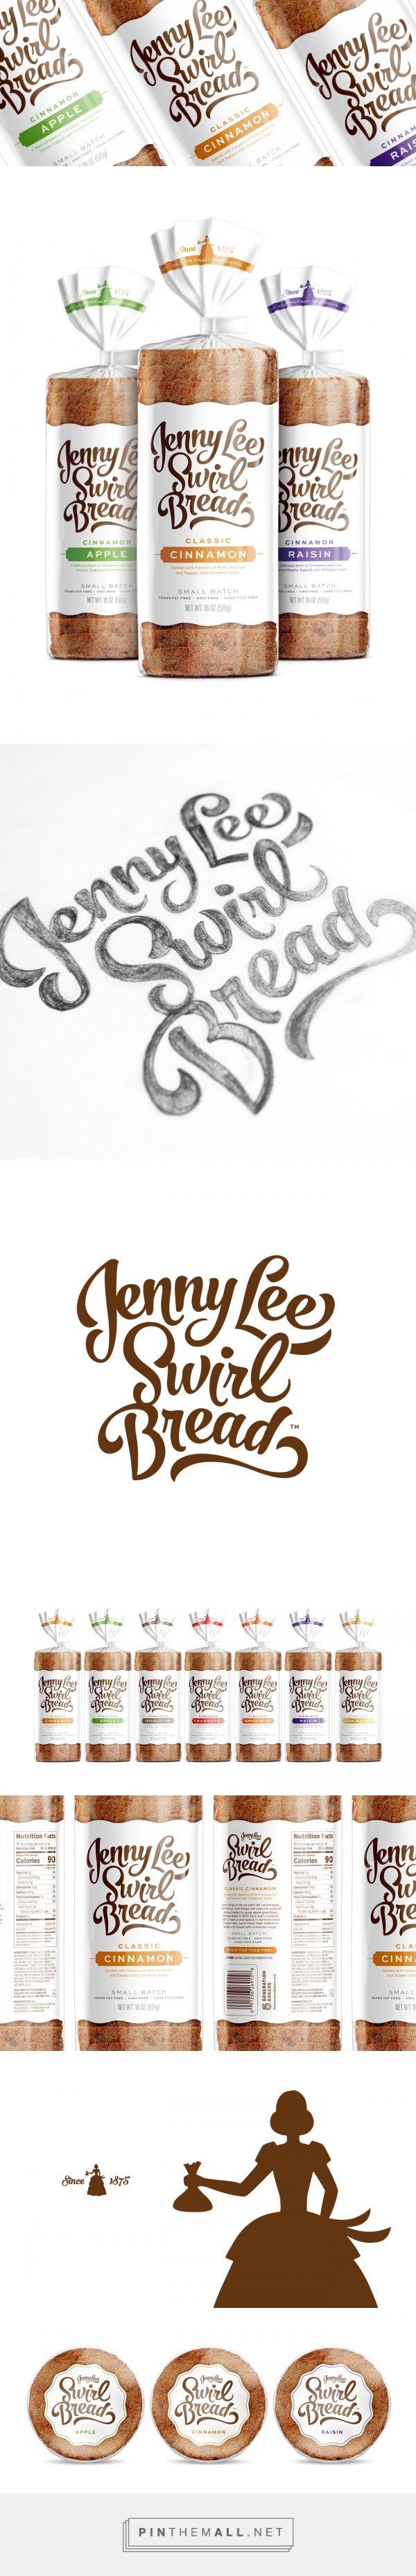 Jenny Lee Swirl Bread - Packaging of the World - Creative Package Design Gallery - http://www.packagingoftheworld.com/2017/01/jenny-lee-swirl-bread.html